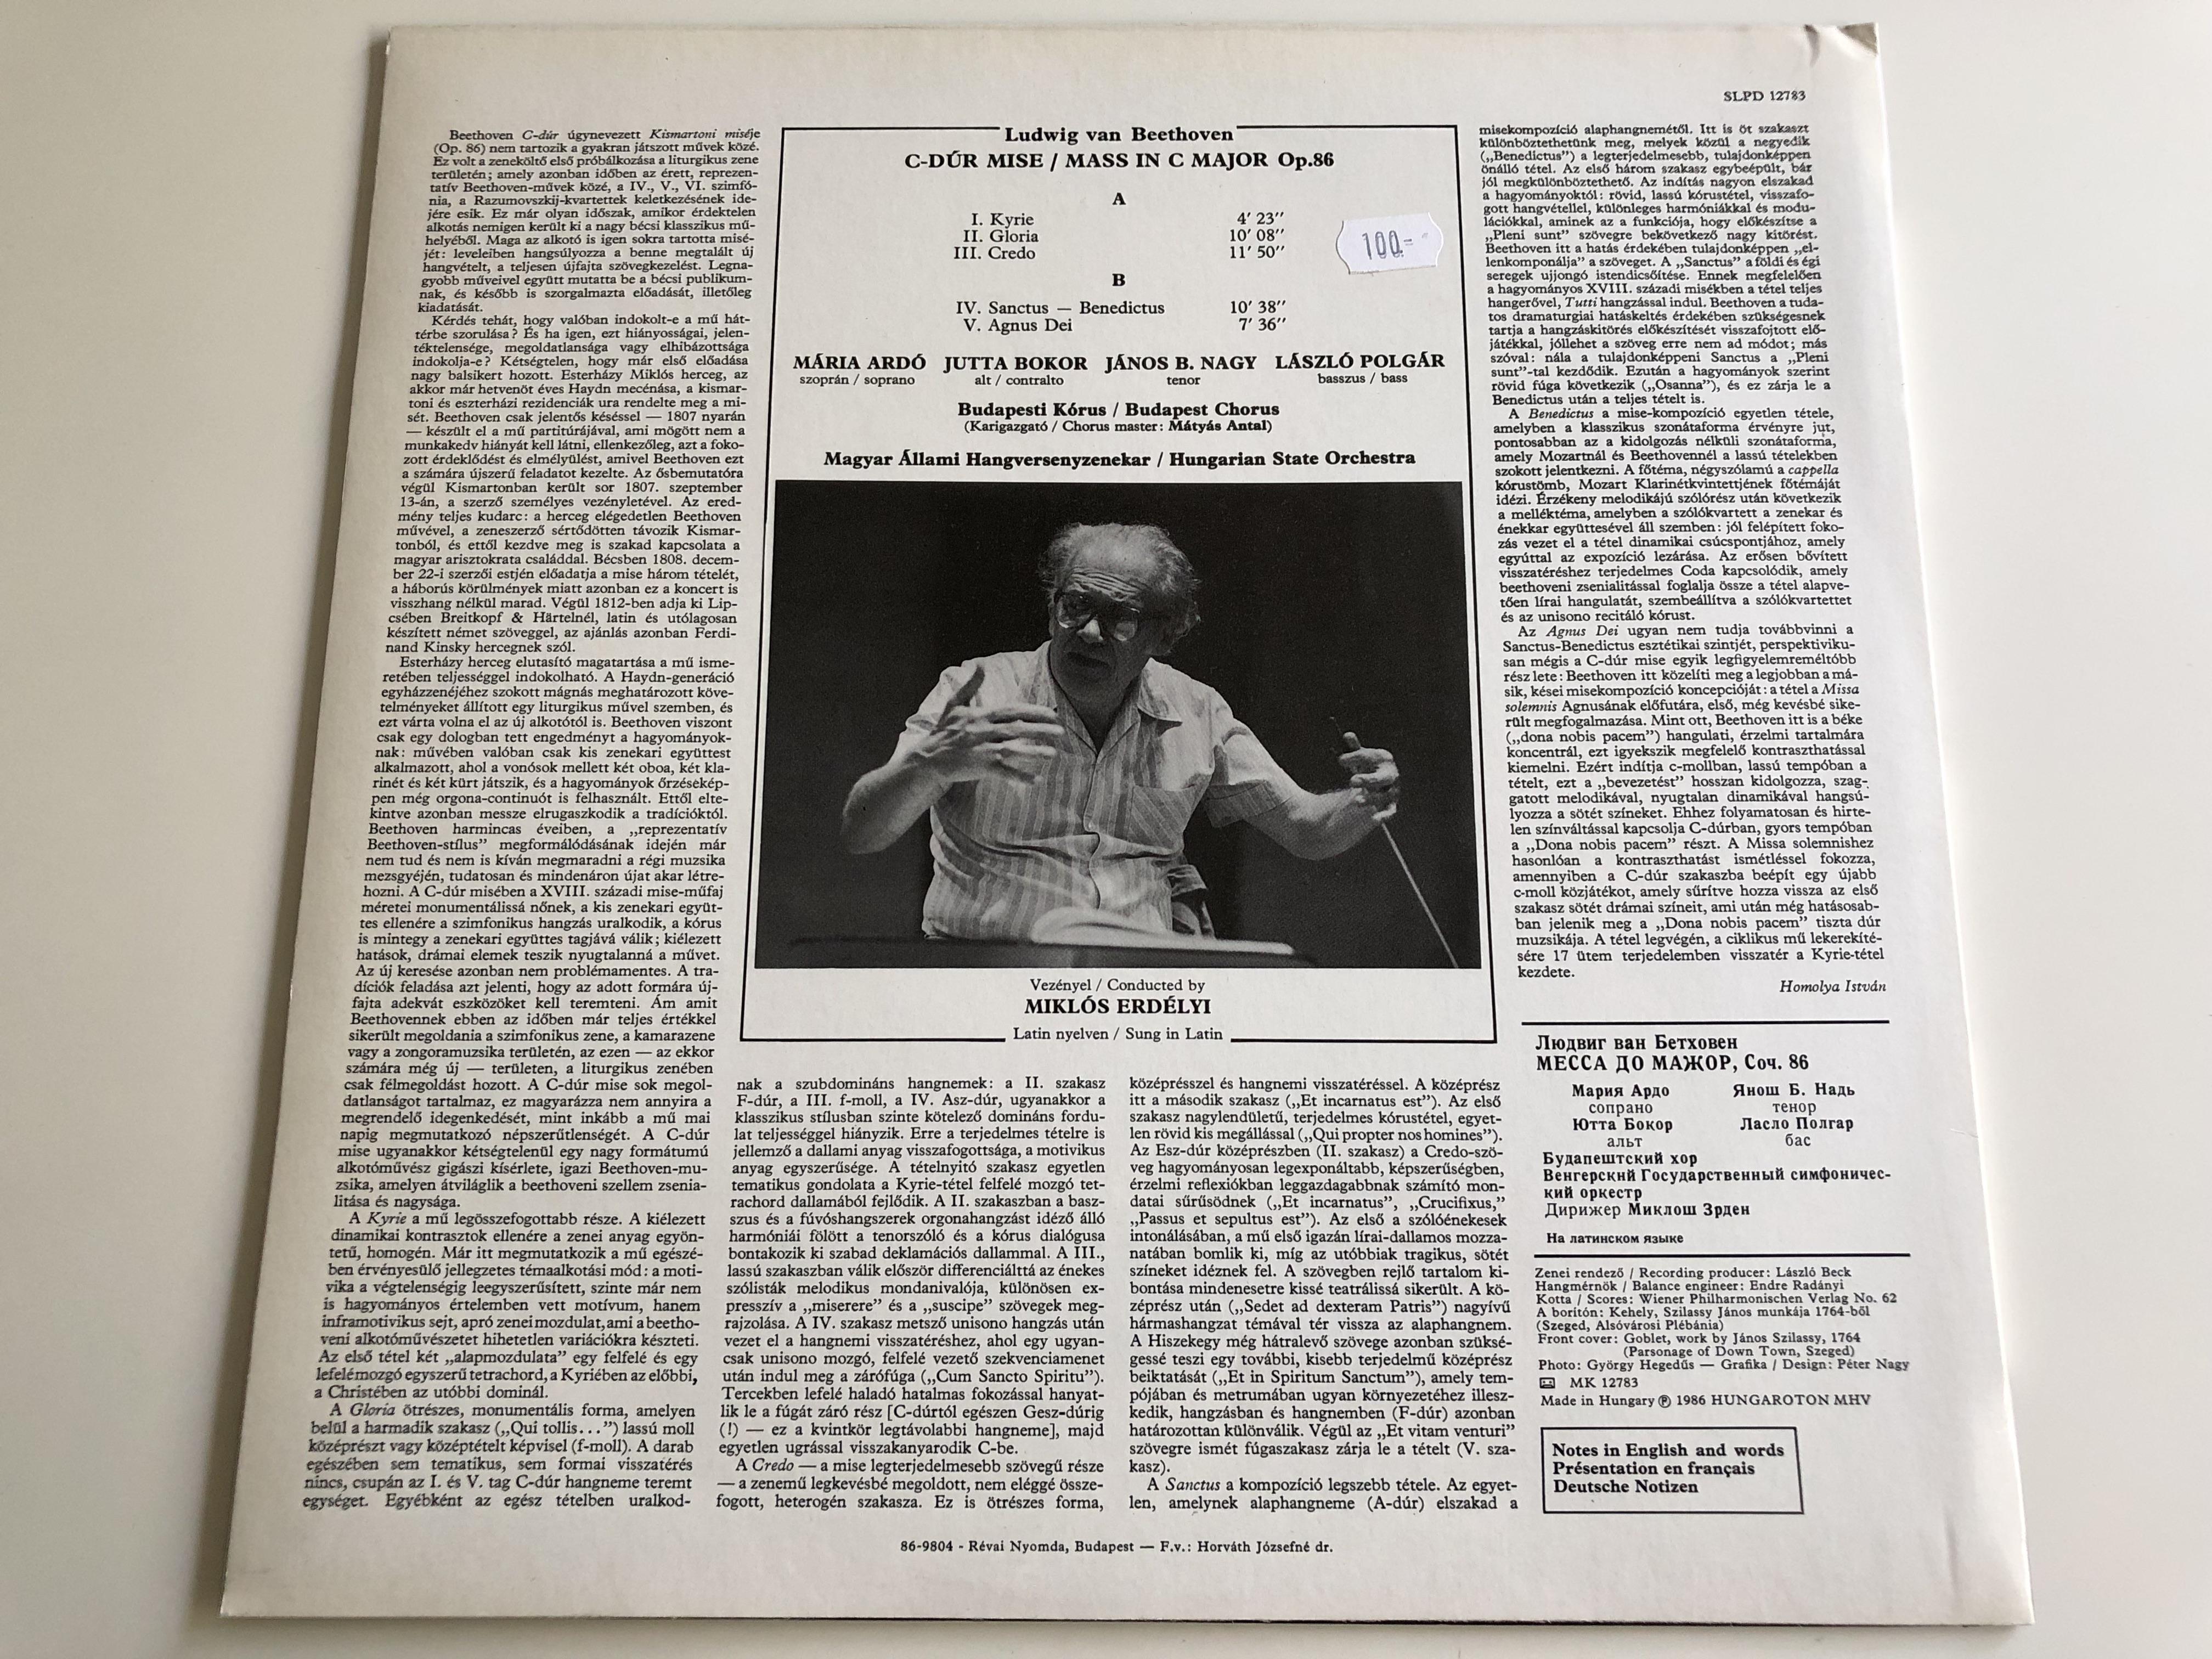 beethoven-mass-in-c-major-op.-86-m-ria-ard-jutta-bokor-j-nos-b.-nagy-l-szl-polg-r-budapest-chorus-hungarian-state-orchestra-conducted-by-mikl-s-erd-lyi-hungaroton-1986-slpd-12783-digital-stereo-3-.jpg